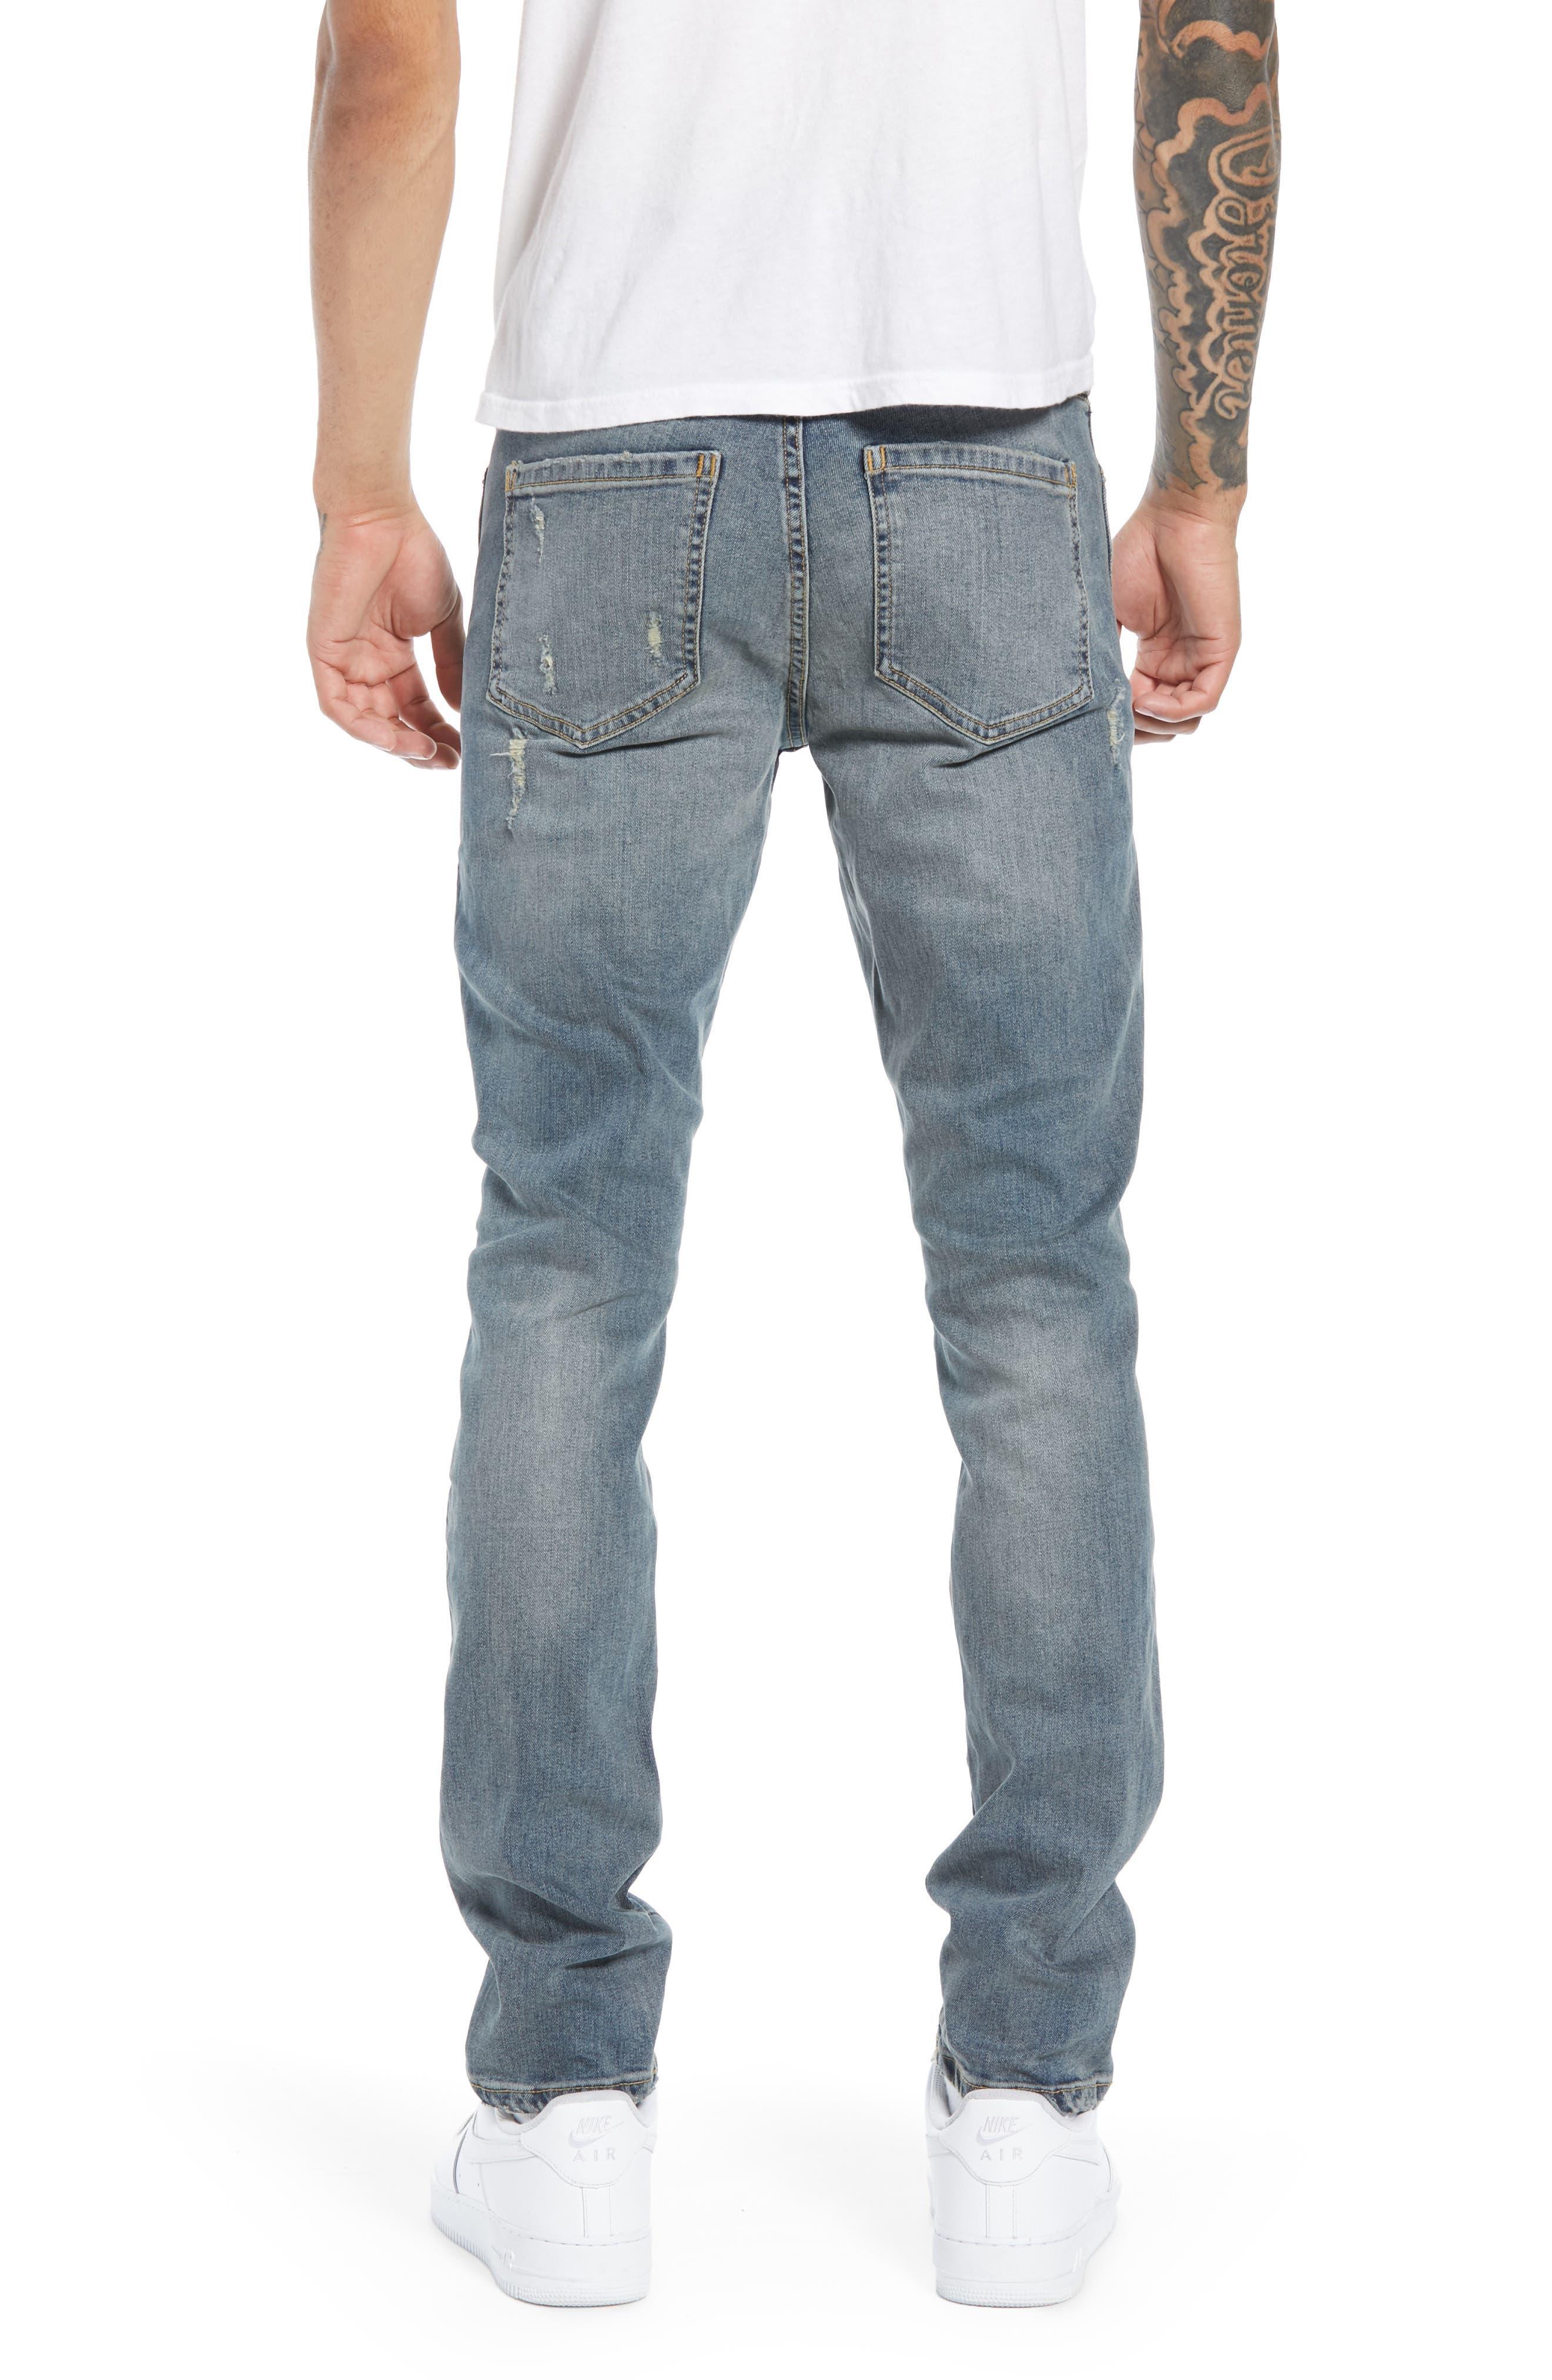 Snap Skinny Fit Jeans,                             Alternate thumbnail 2, color,                             LIGHT OLD DESTROY